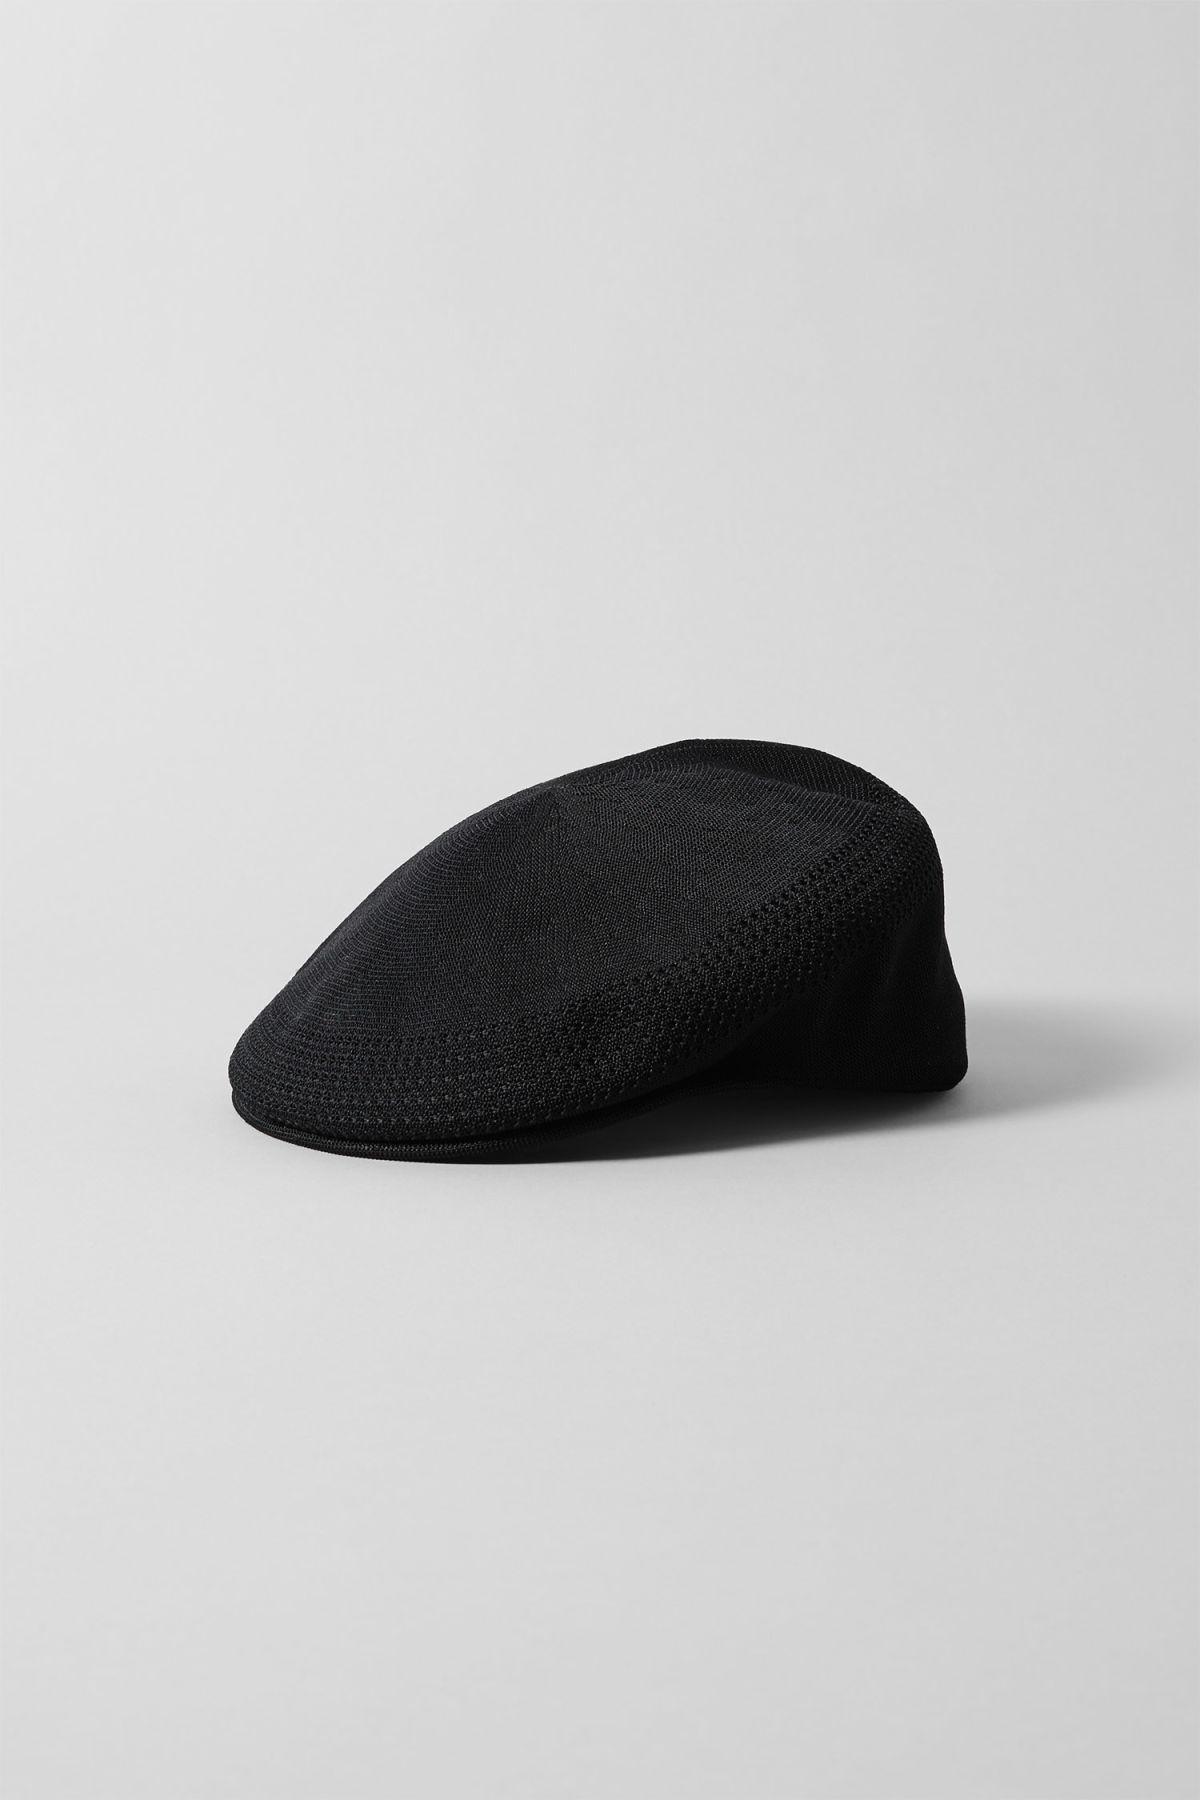 Tropic 504 Ventair Cap - Black-M